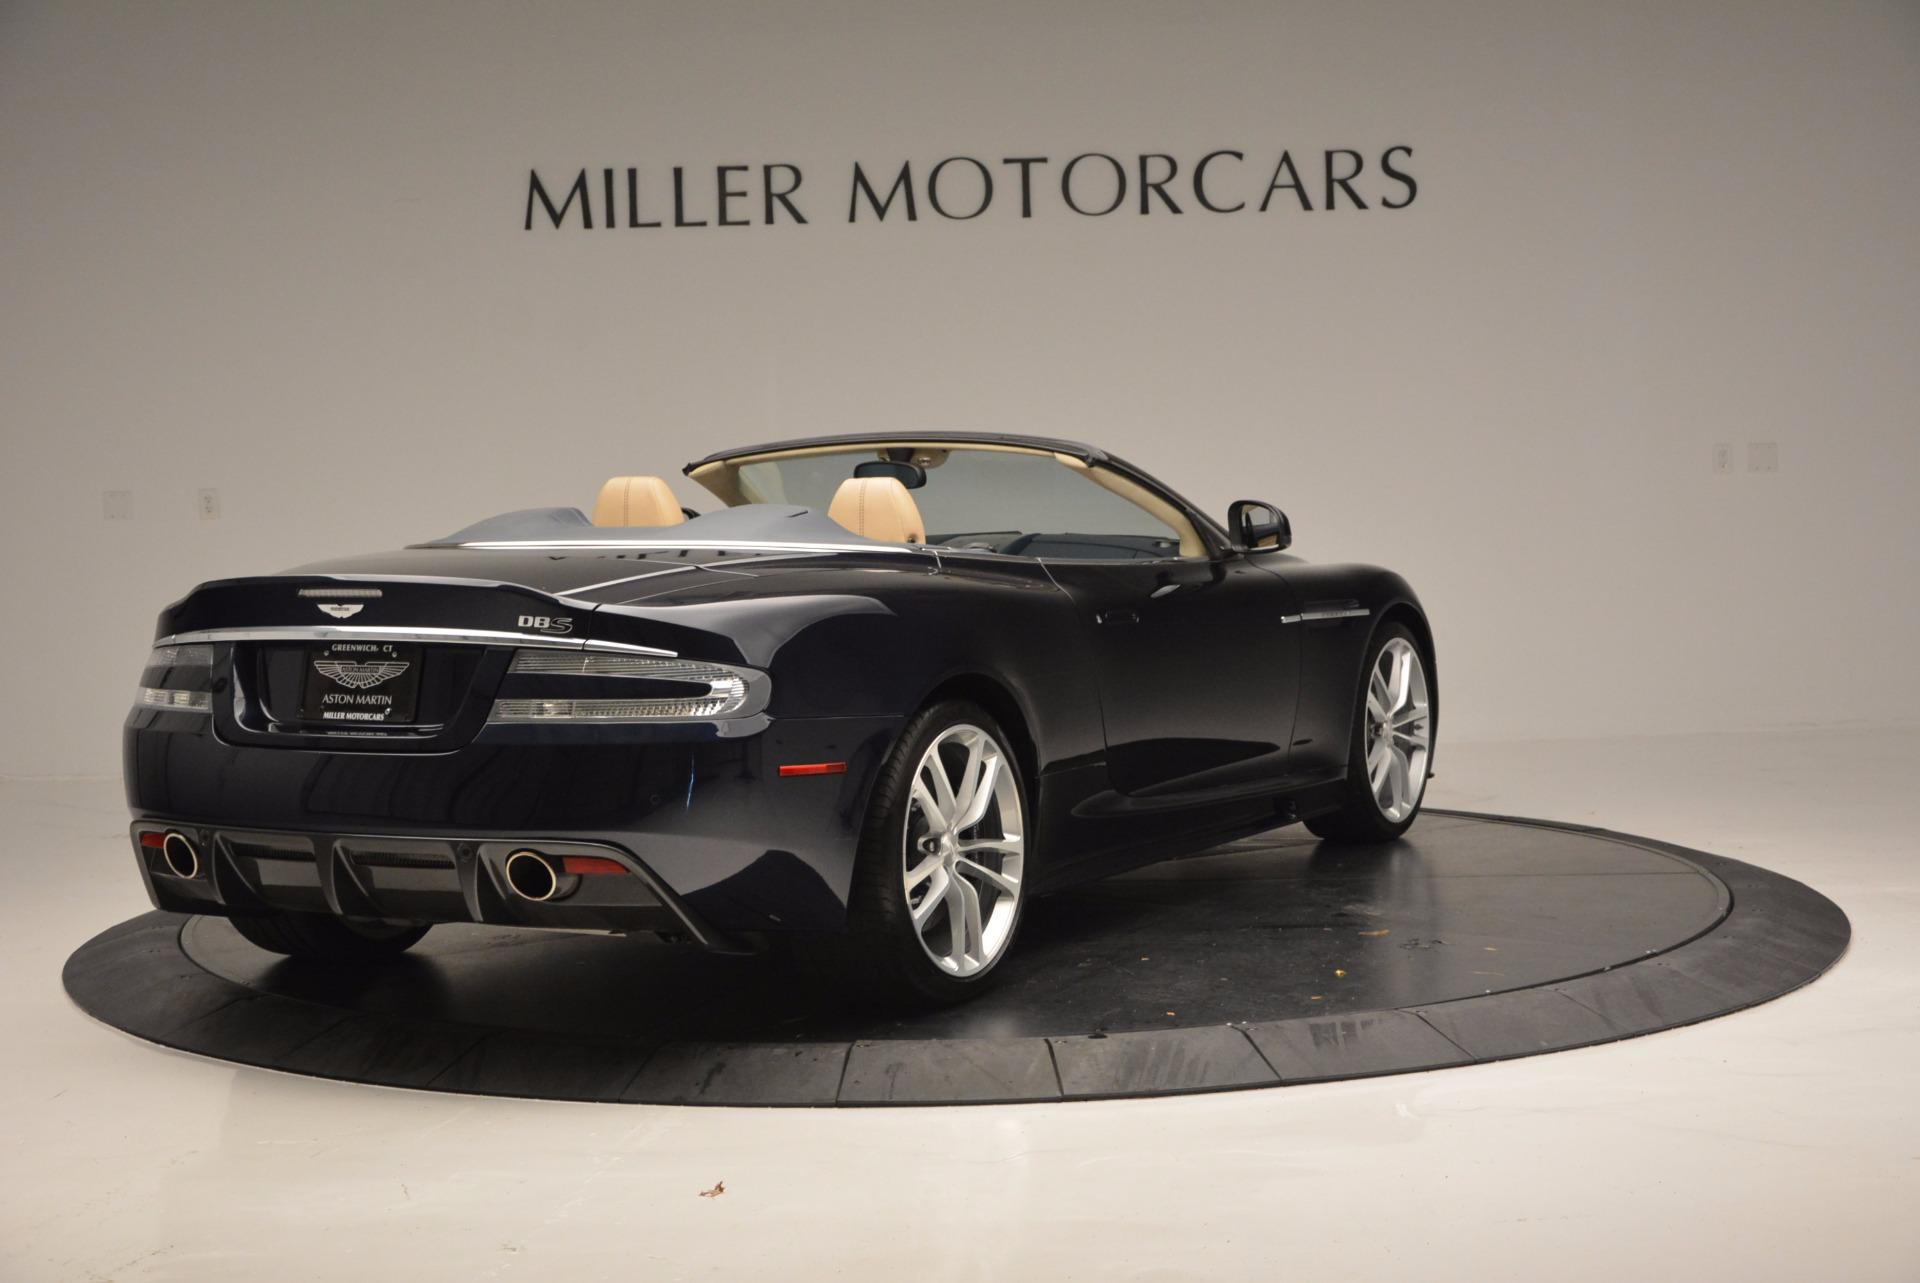 Used 2012 Aston Martin DBS Volante For Sale In Greenwich, CT 644_p7